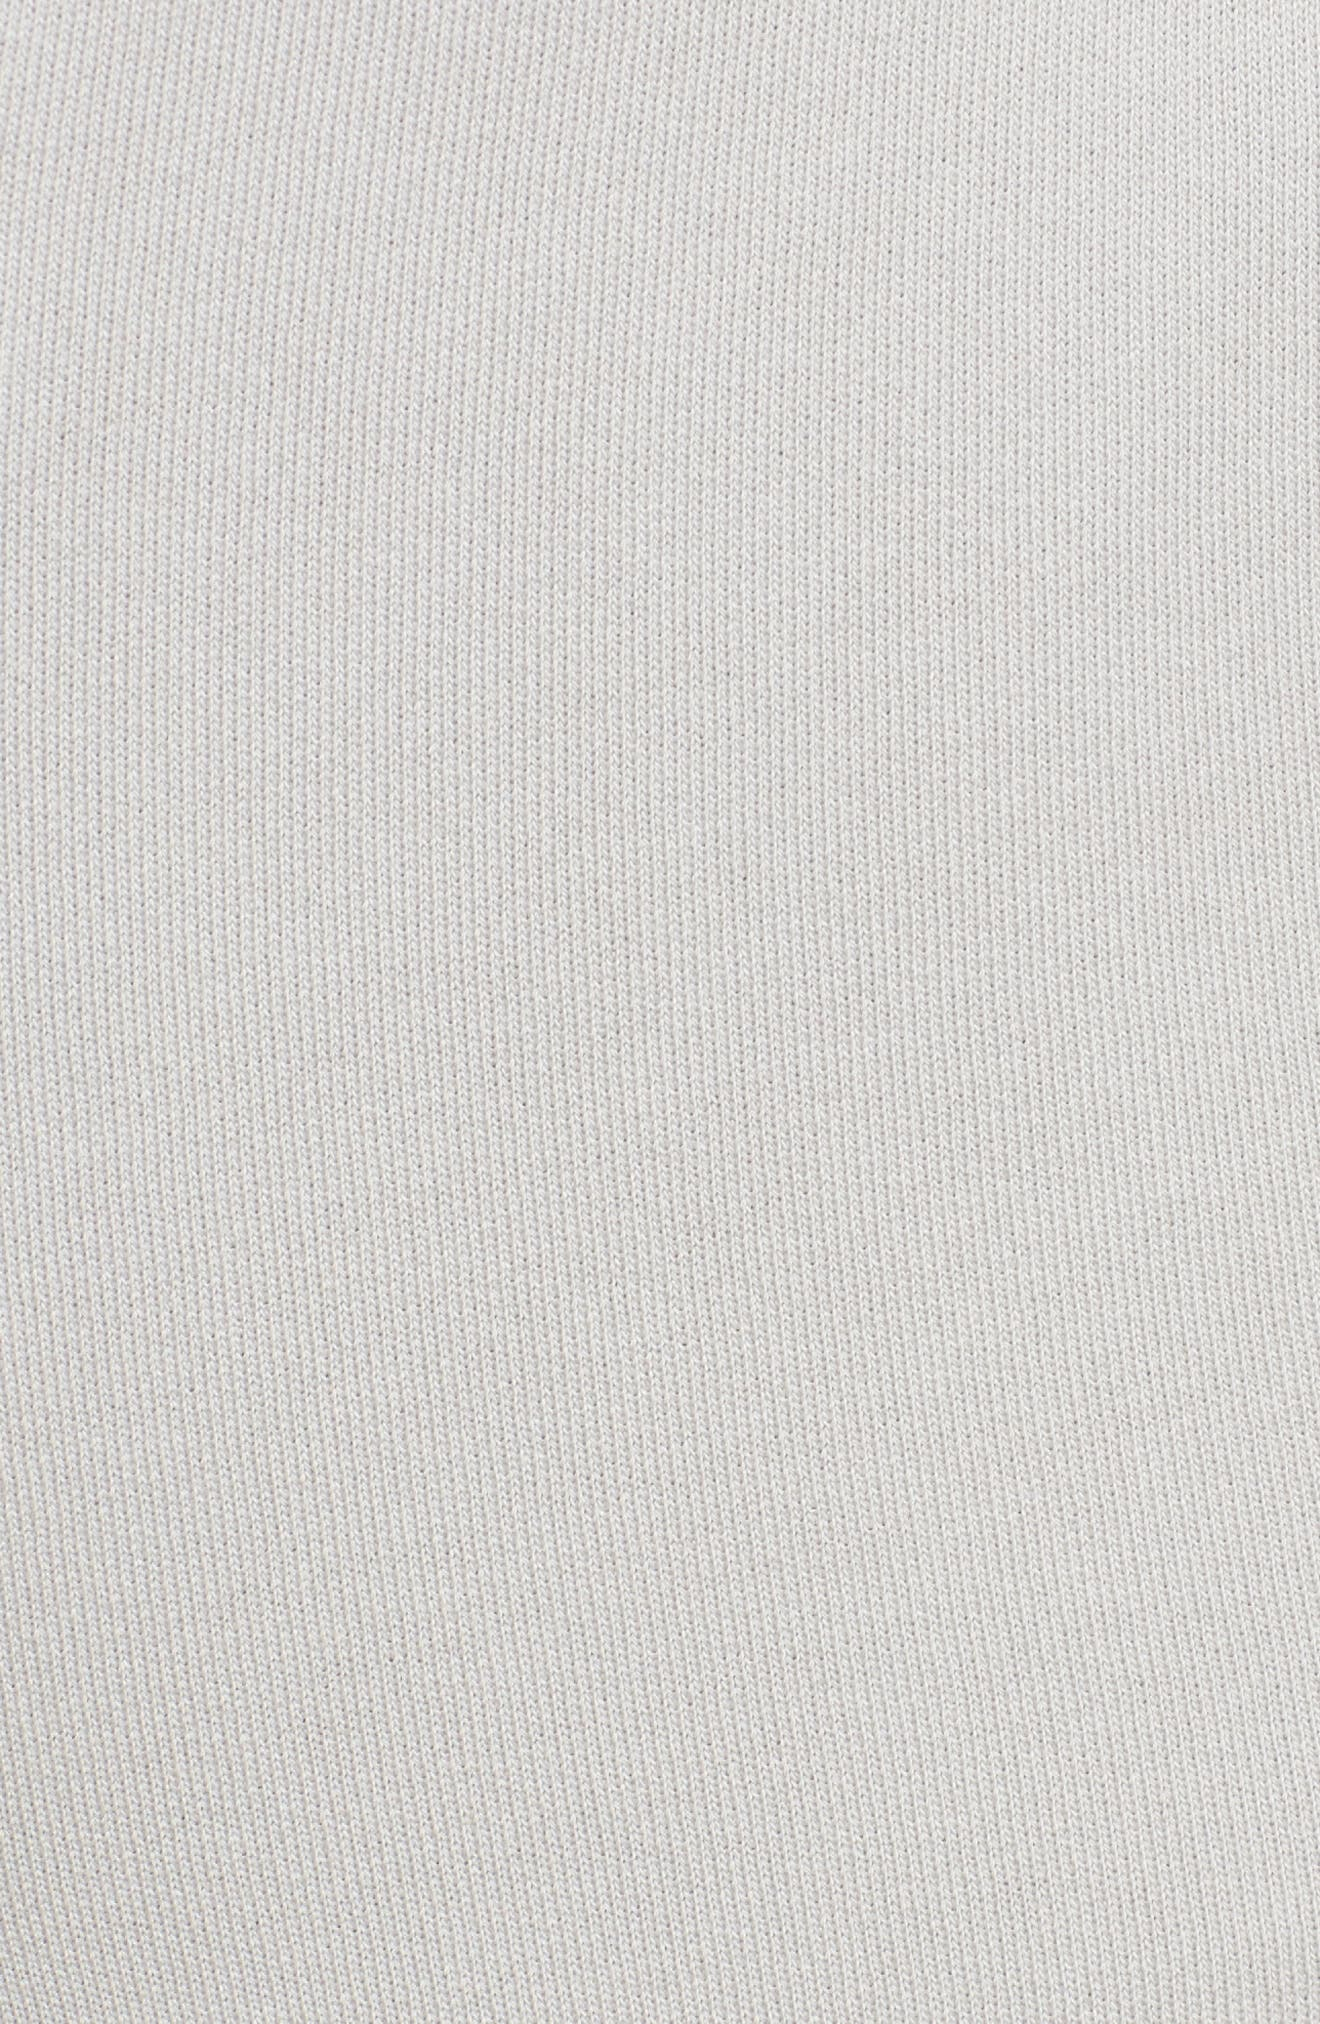 Fleece Knit Gauchos,                             Alternate thumbnail 5, color,                             038